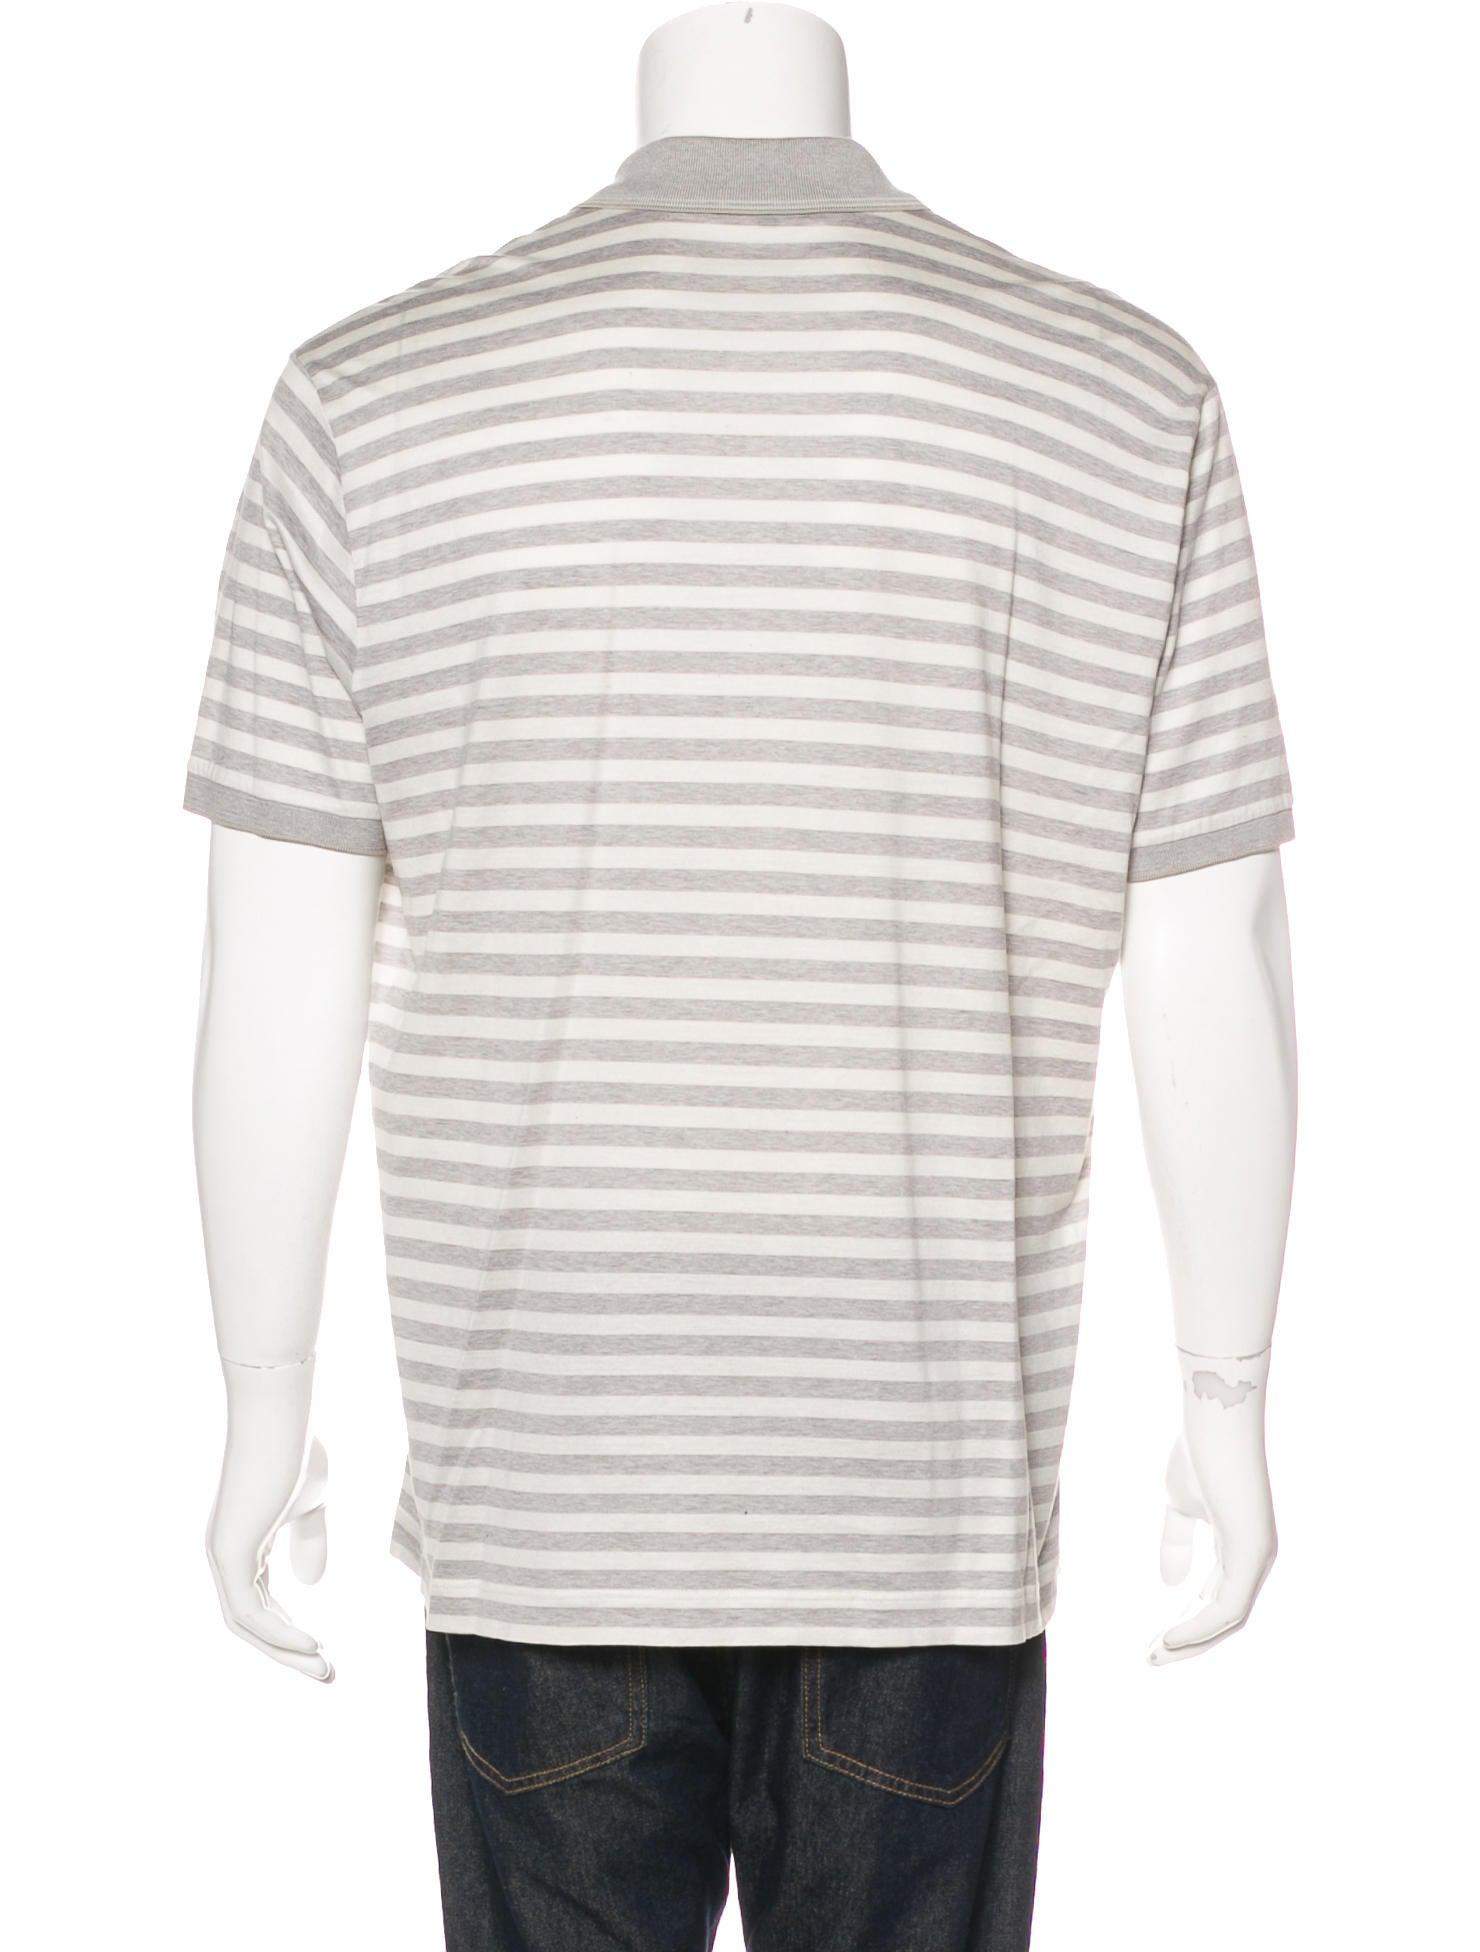 Loro Piana Silk Blend Striped Polo Shirt Clothing